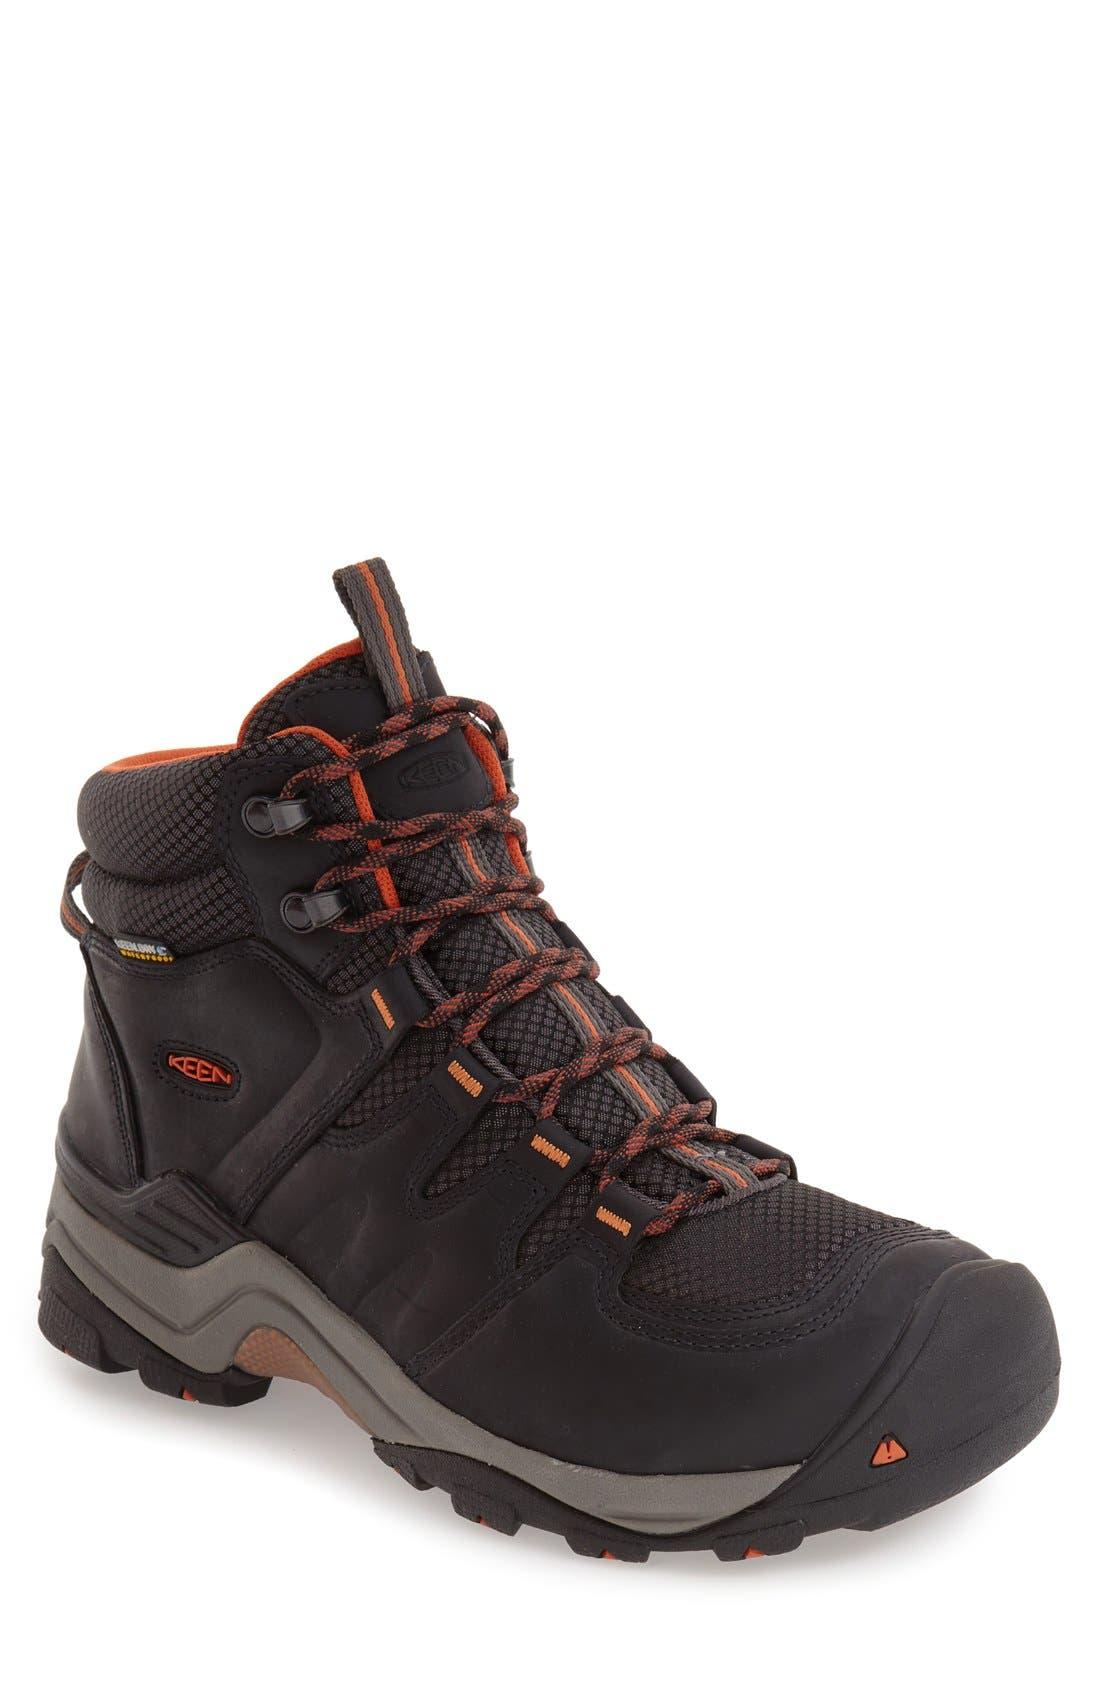 KEEN Gypsum II Waterproof Hiking Boot, Main, color, BLACK NUBUCK LEATHER